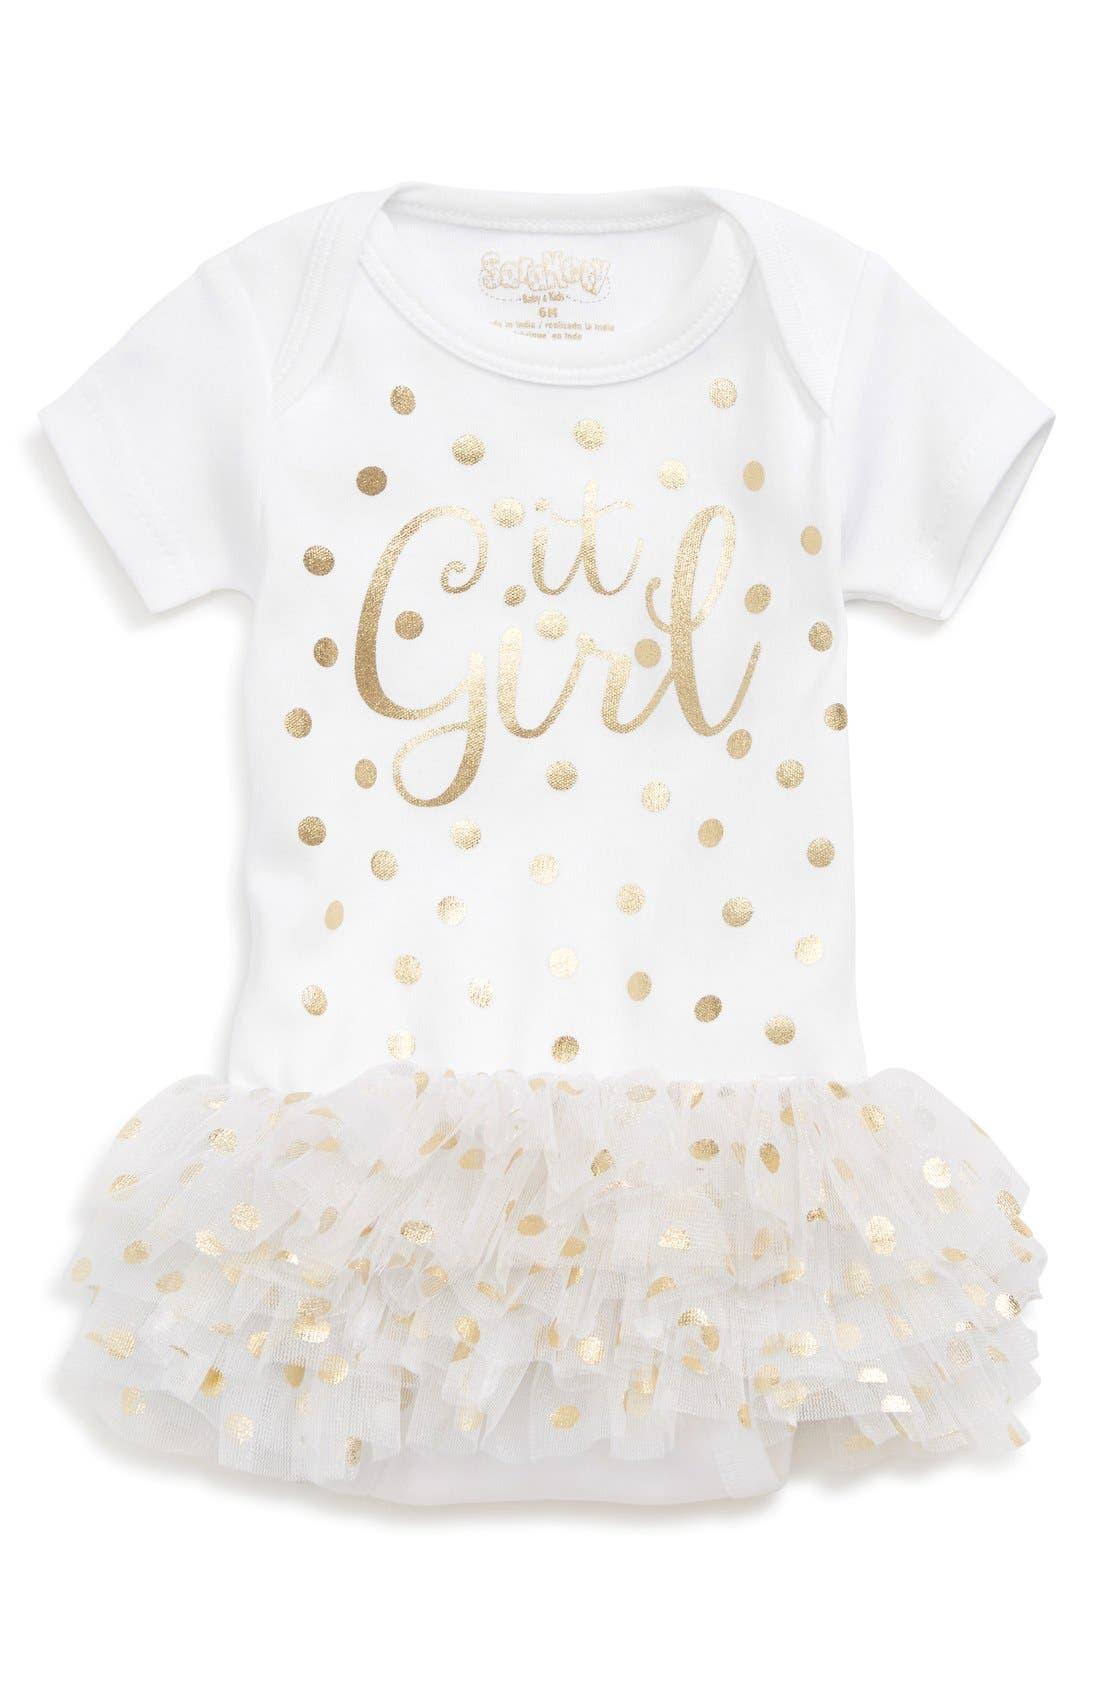 Sara Kety Baby & Kids 'It Girl' Tutu Bodysuit (Baby Girls)